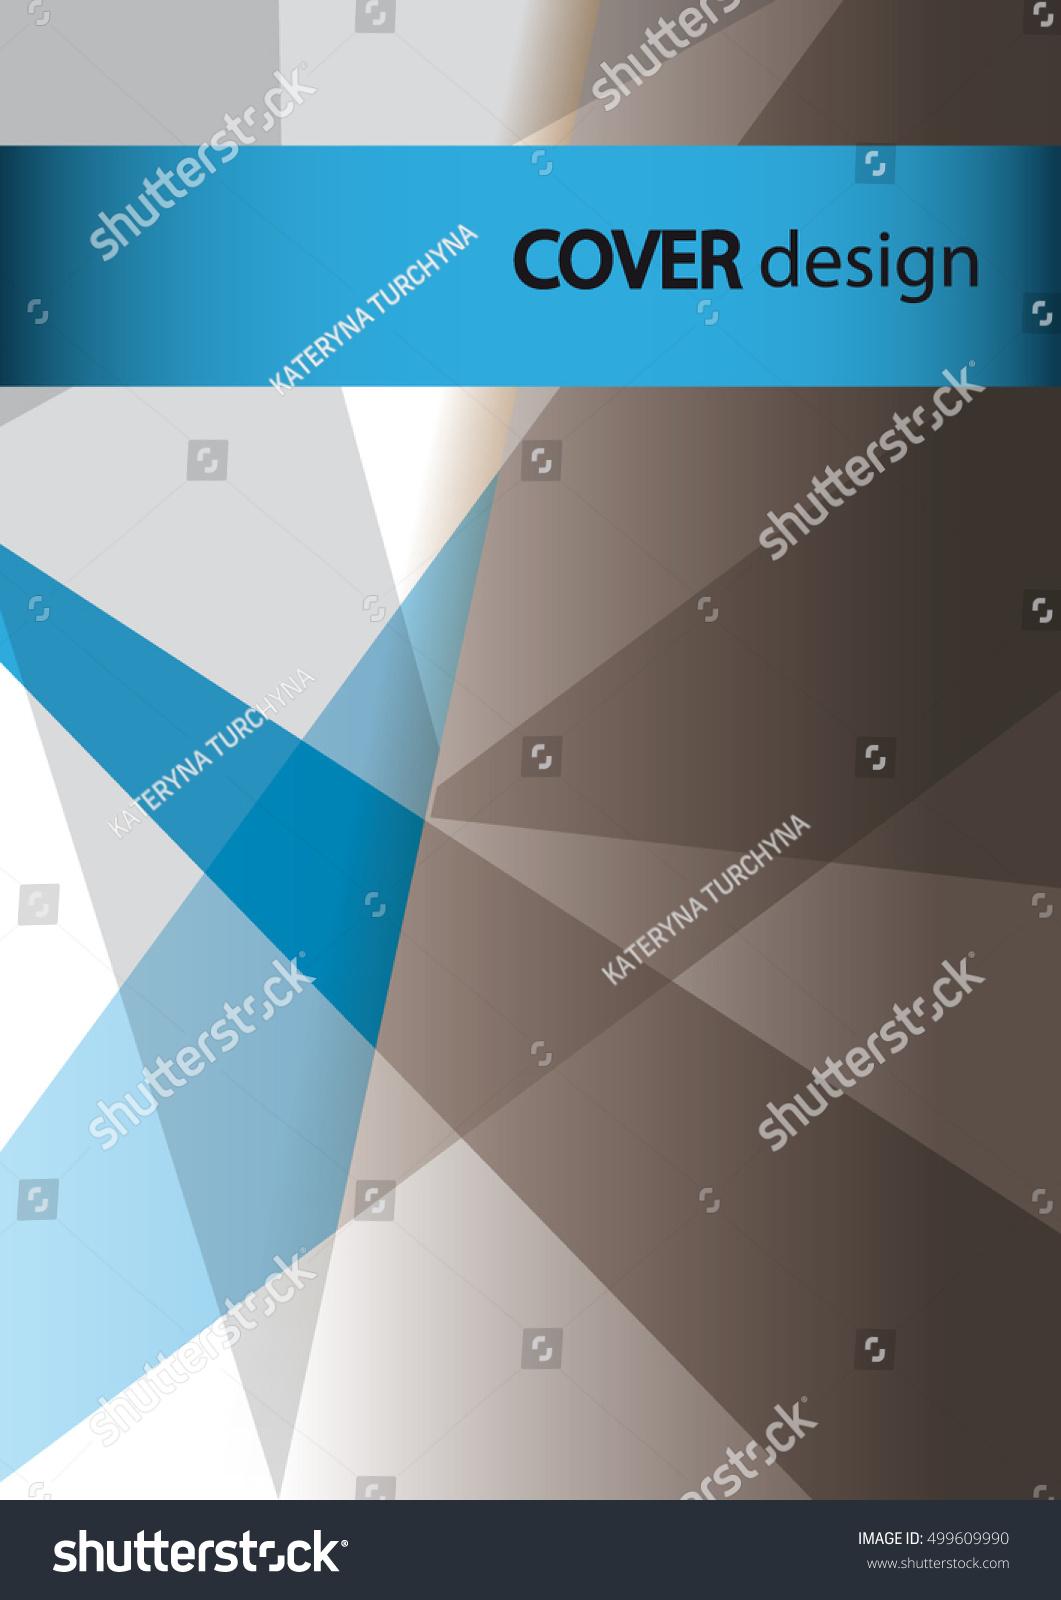 cover design business brochure cover template stock vector, Presentation templates